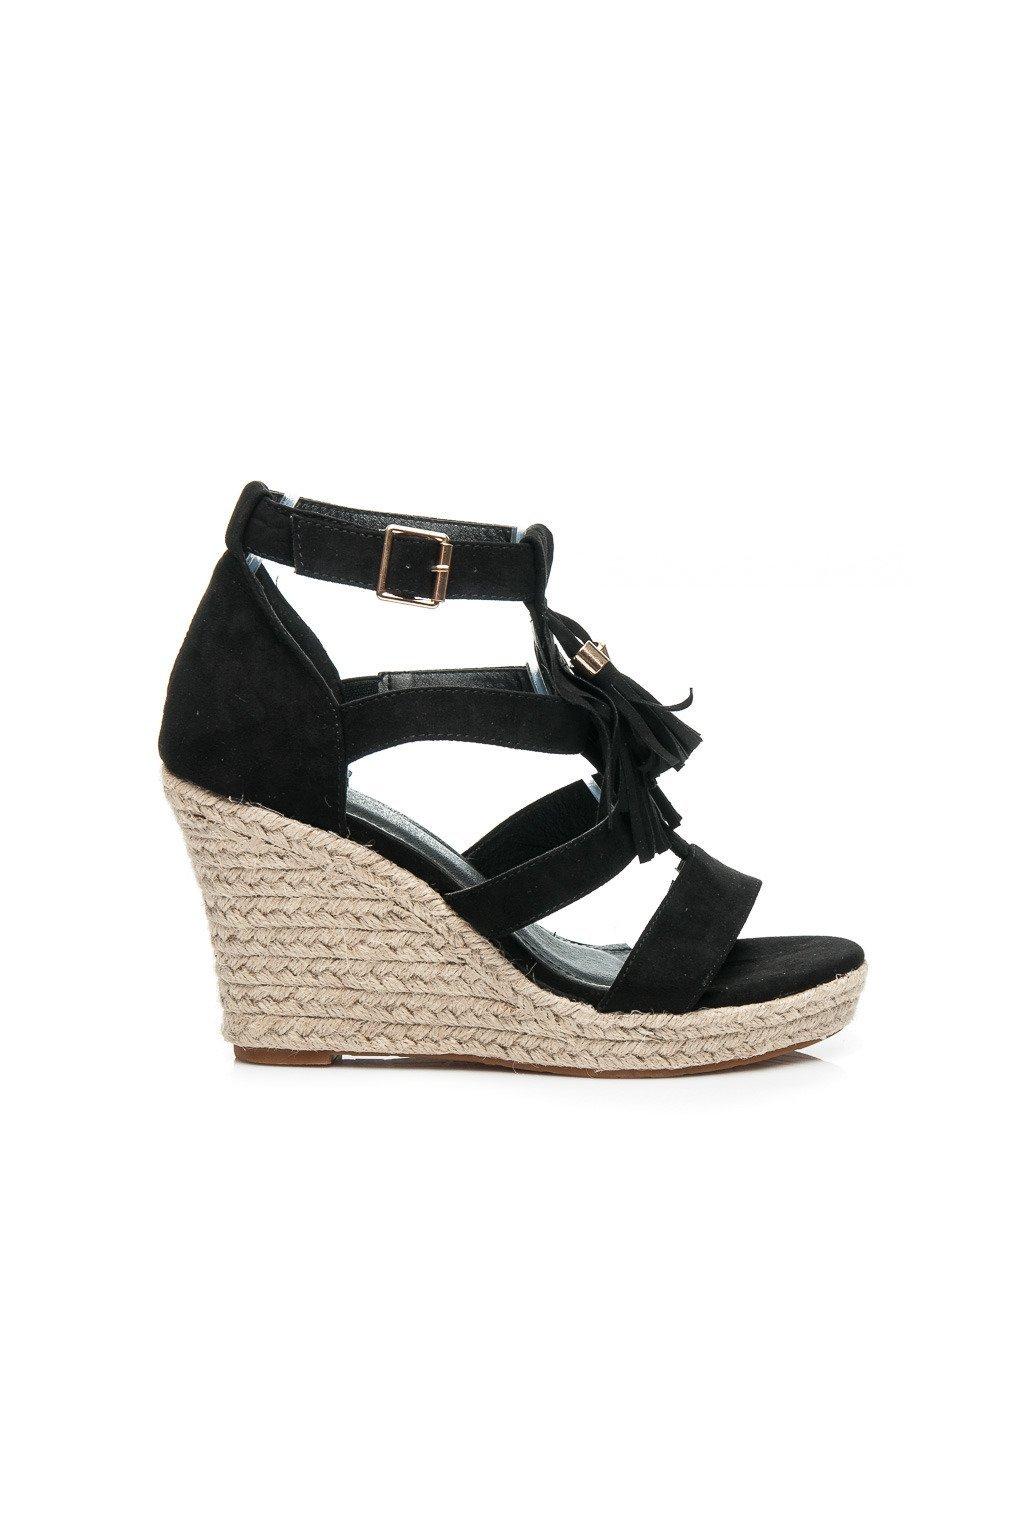 Čierne sandále BOHO 6021-1B